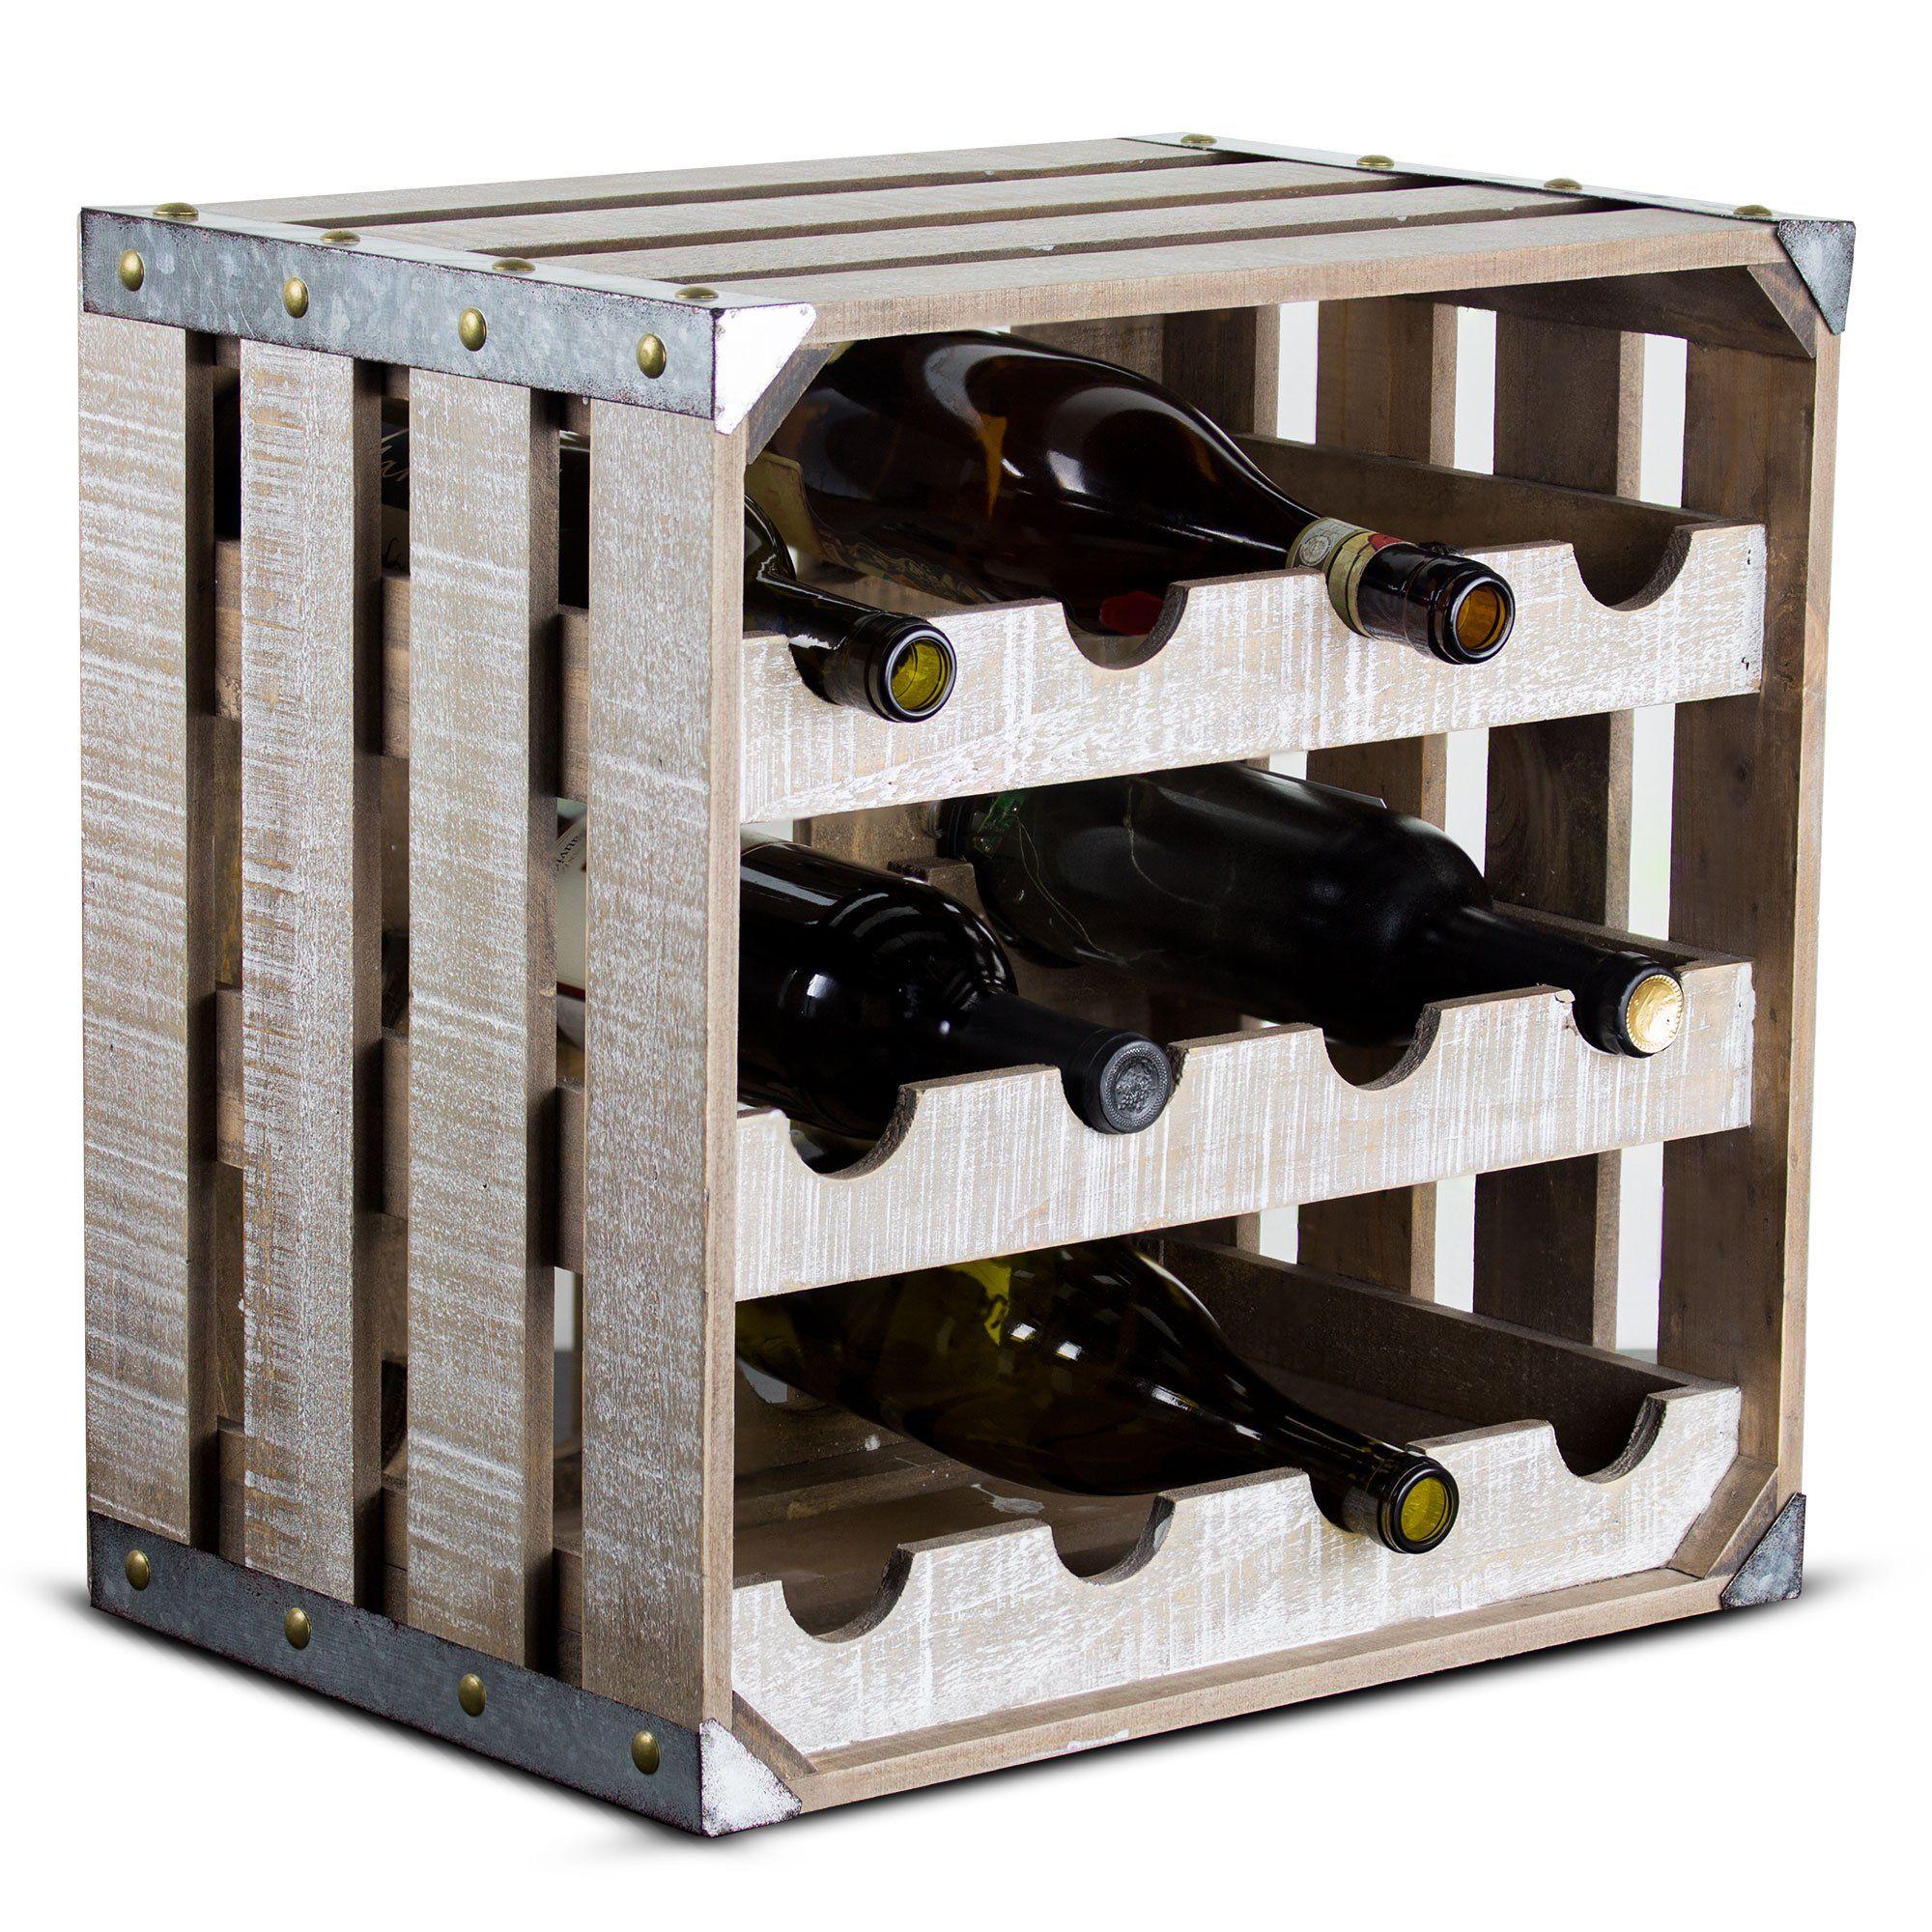 Rustic 12 Bottle Wine Rack Farmhouse Wood Crate Americanartdecor Com Rustic Wine Racks Wine Rack Wine Bottle Rack